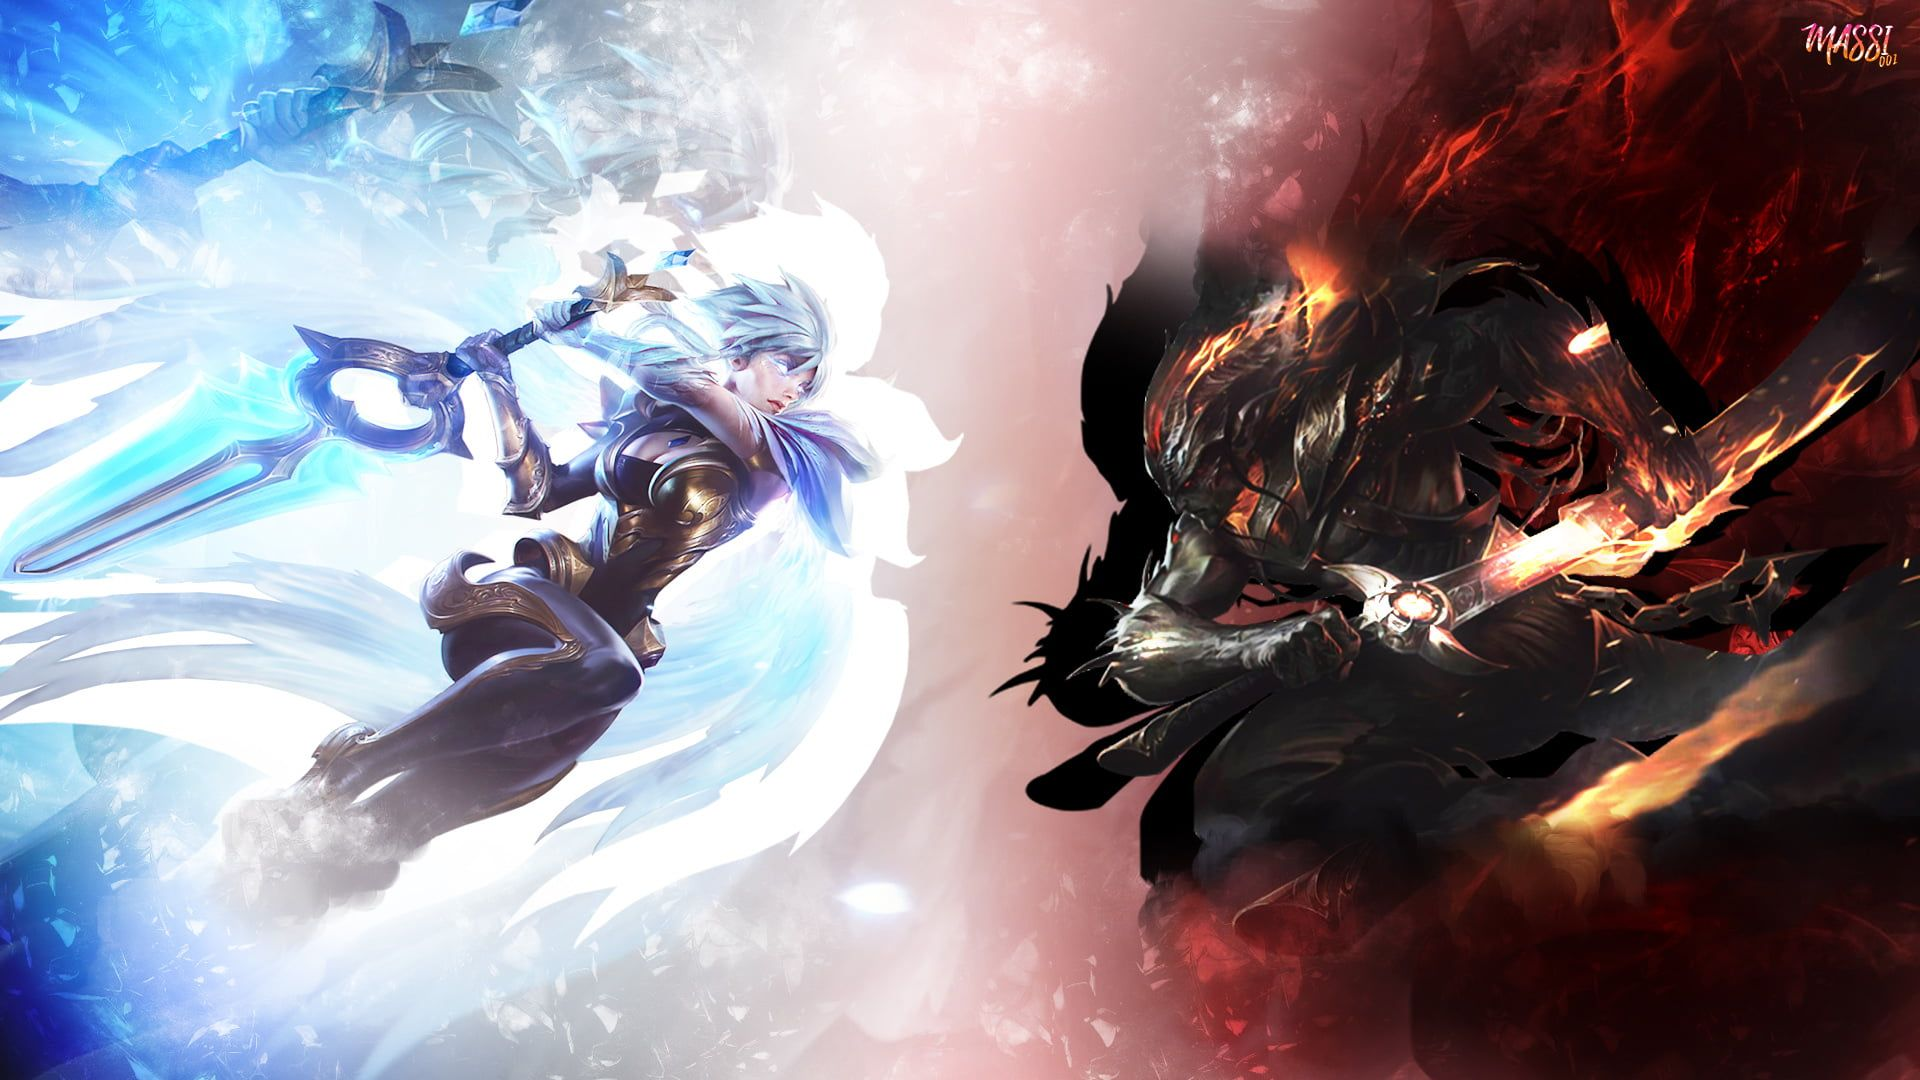 Riven Vs Yasuo Wallpaper Yasuo League Of Legends Riven League